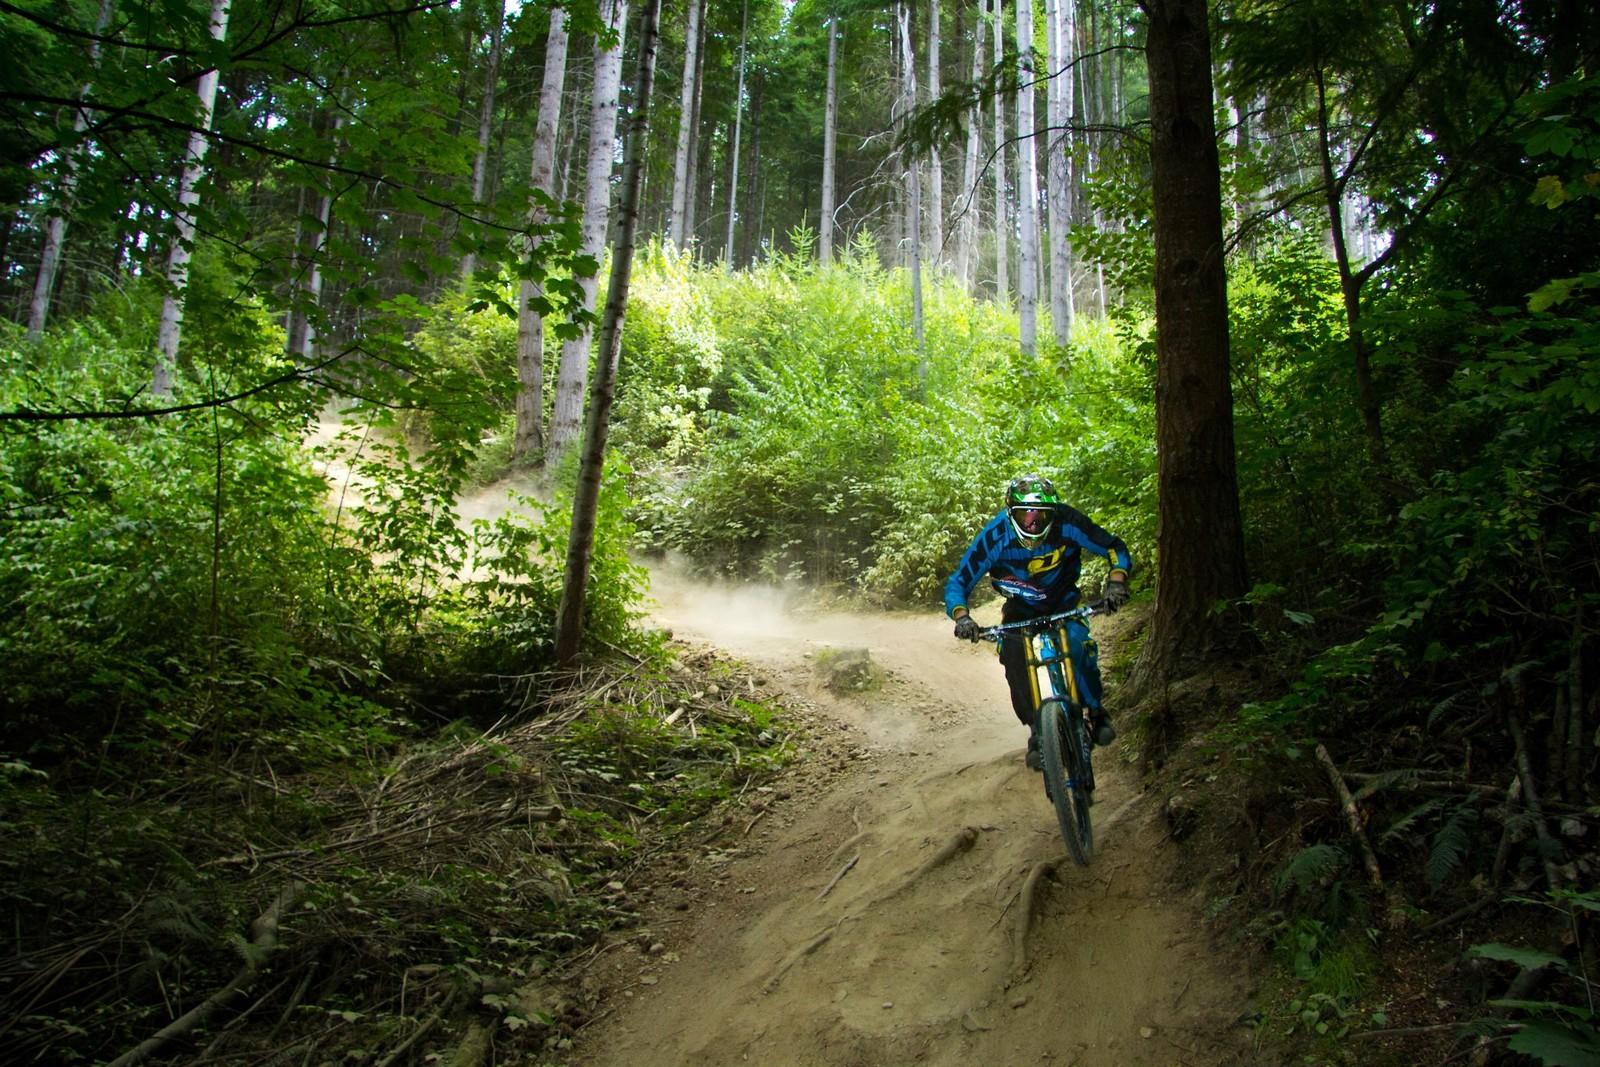 Single Track Sandwich - Banditdh - Mountain Biking Pictures - Vital MTB